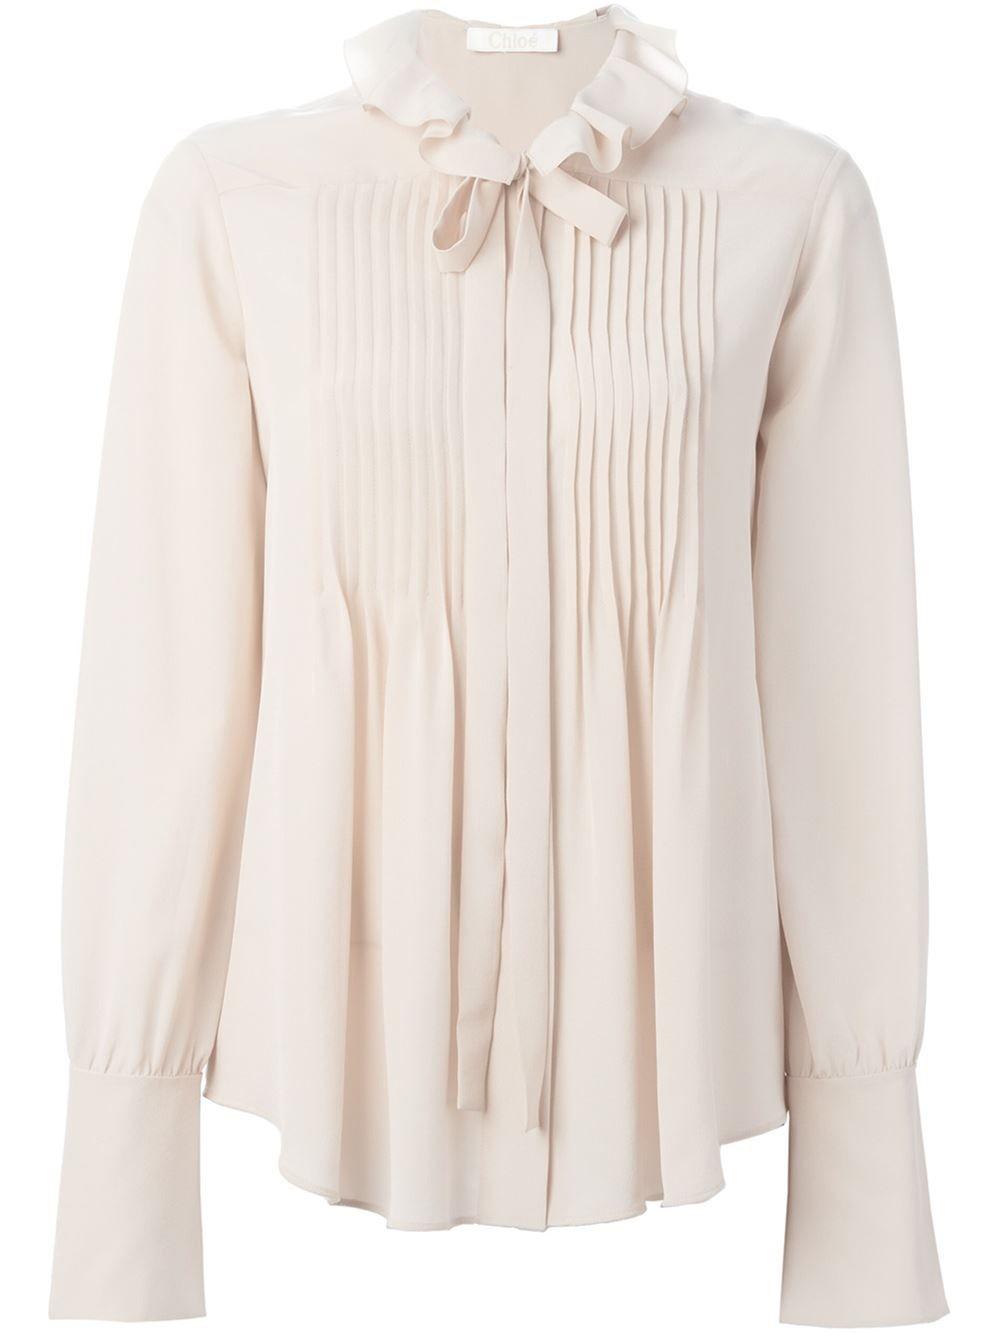 Chloé Bow Detail Shirt - Bungalow-gallery - Farfetch.com  c0bb9662bd5